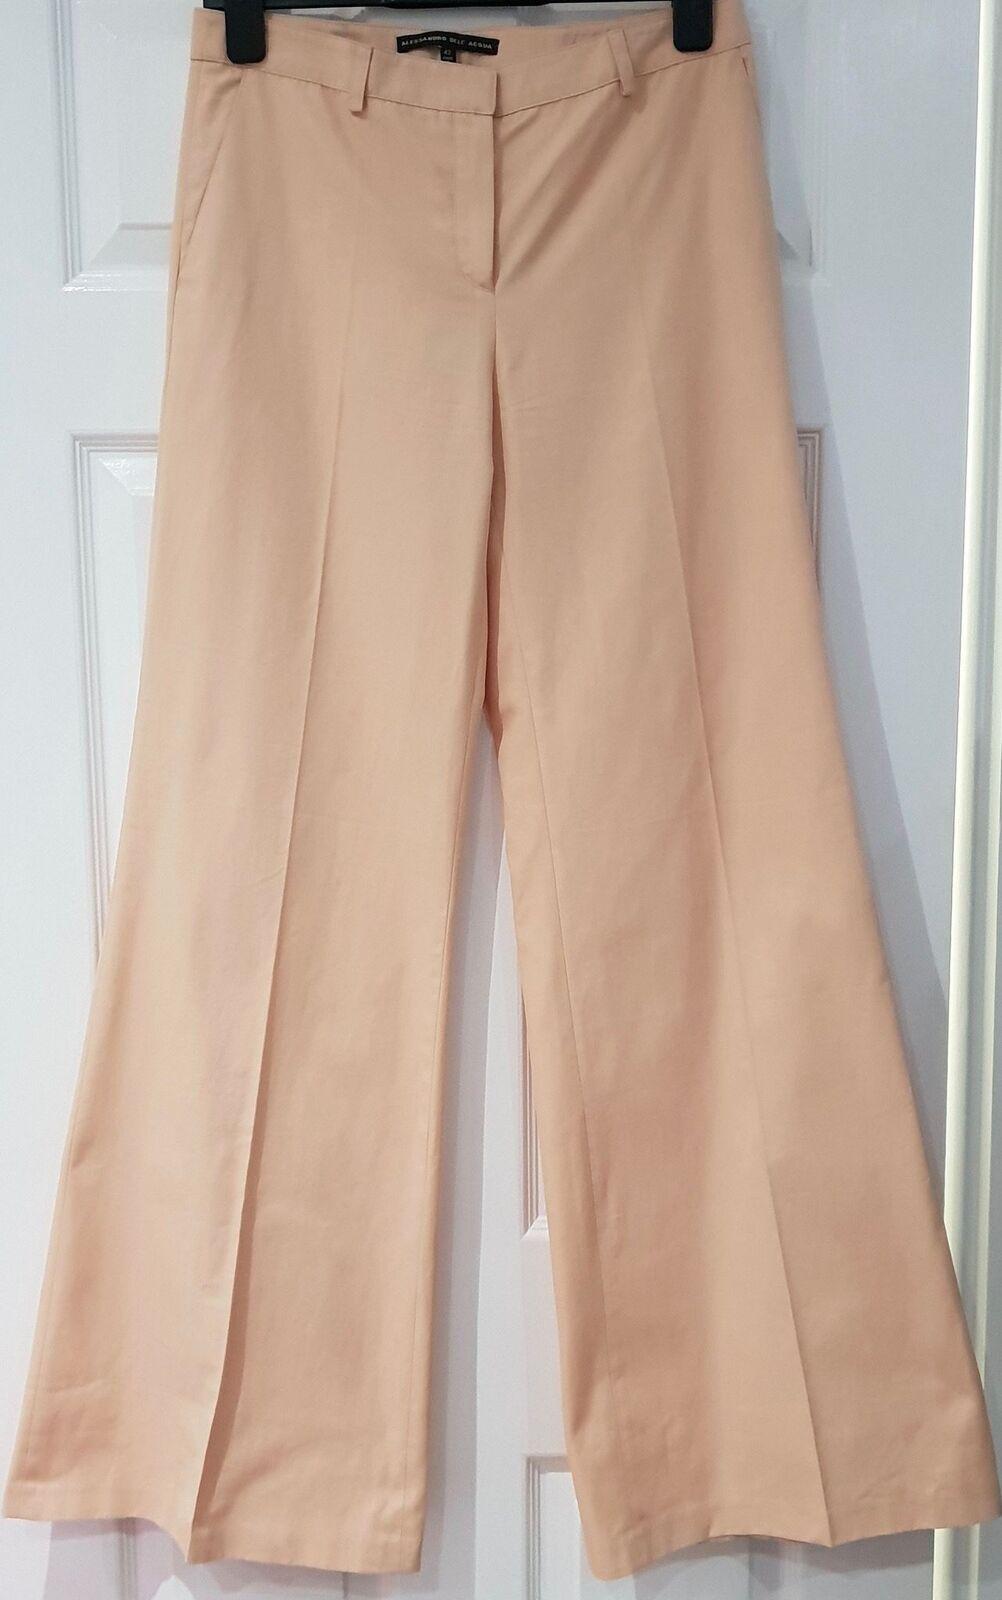 ALESSANDRO DELL ACQUA Peach rosa Cotone Pantaloni Gamba Larga Flare Pantaloni IT42 UK10